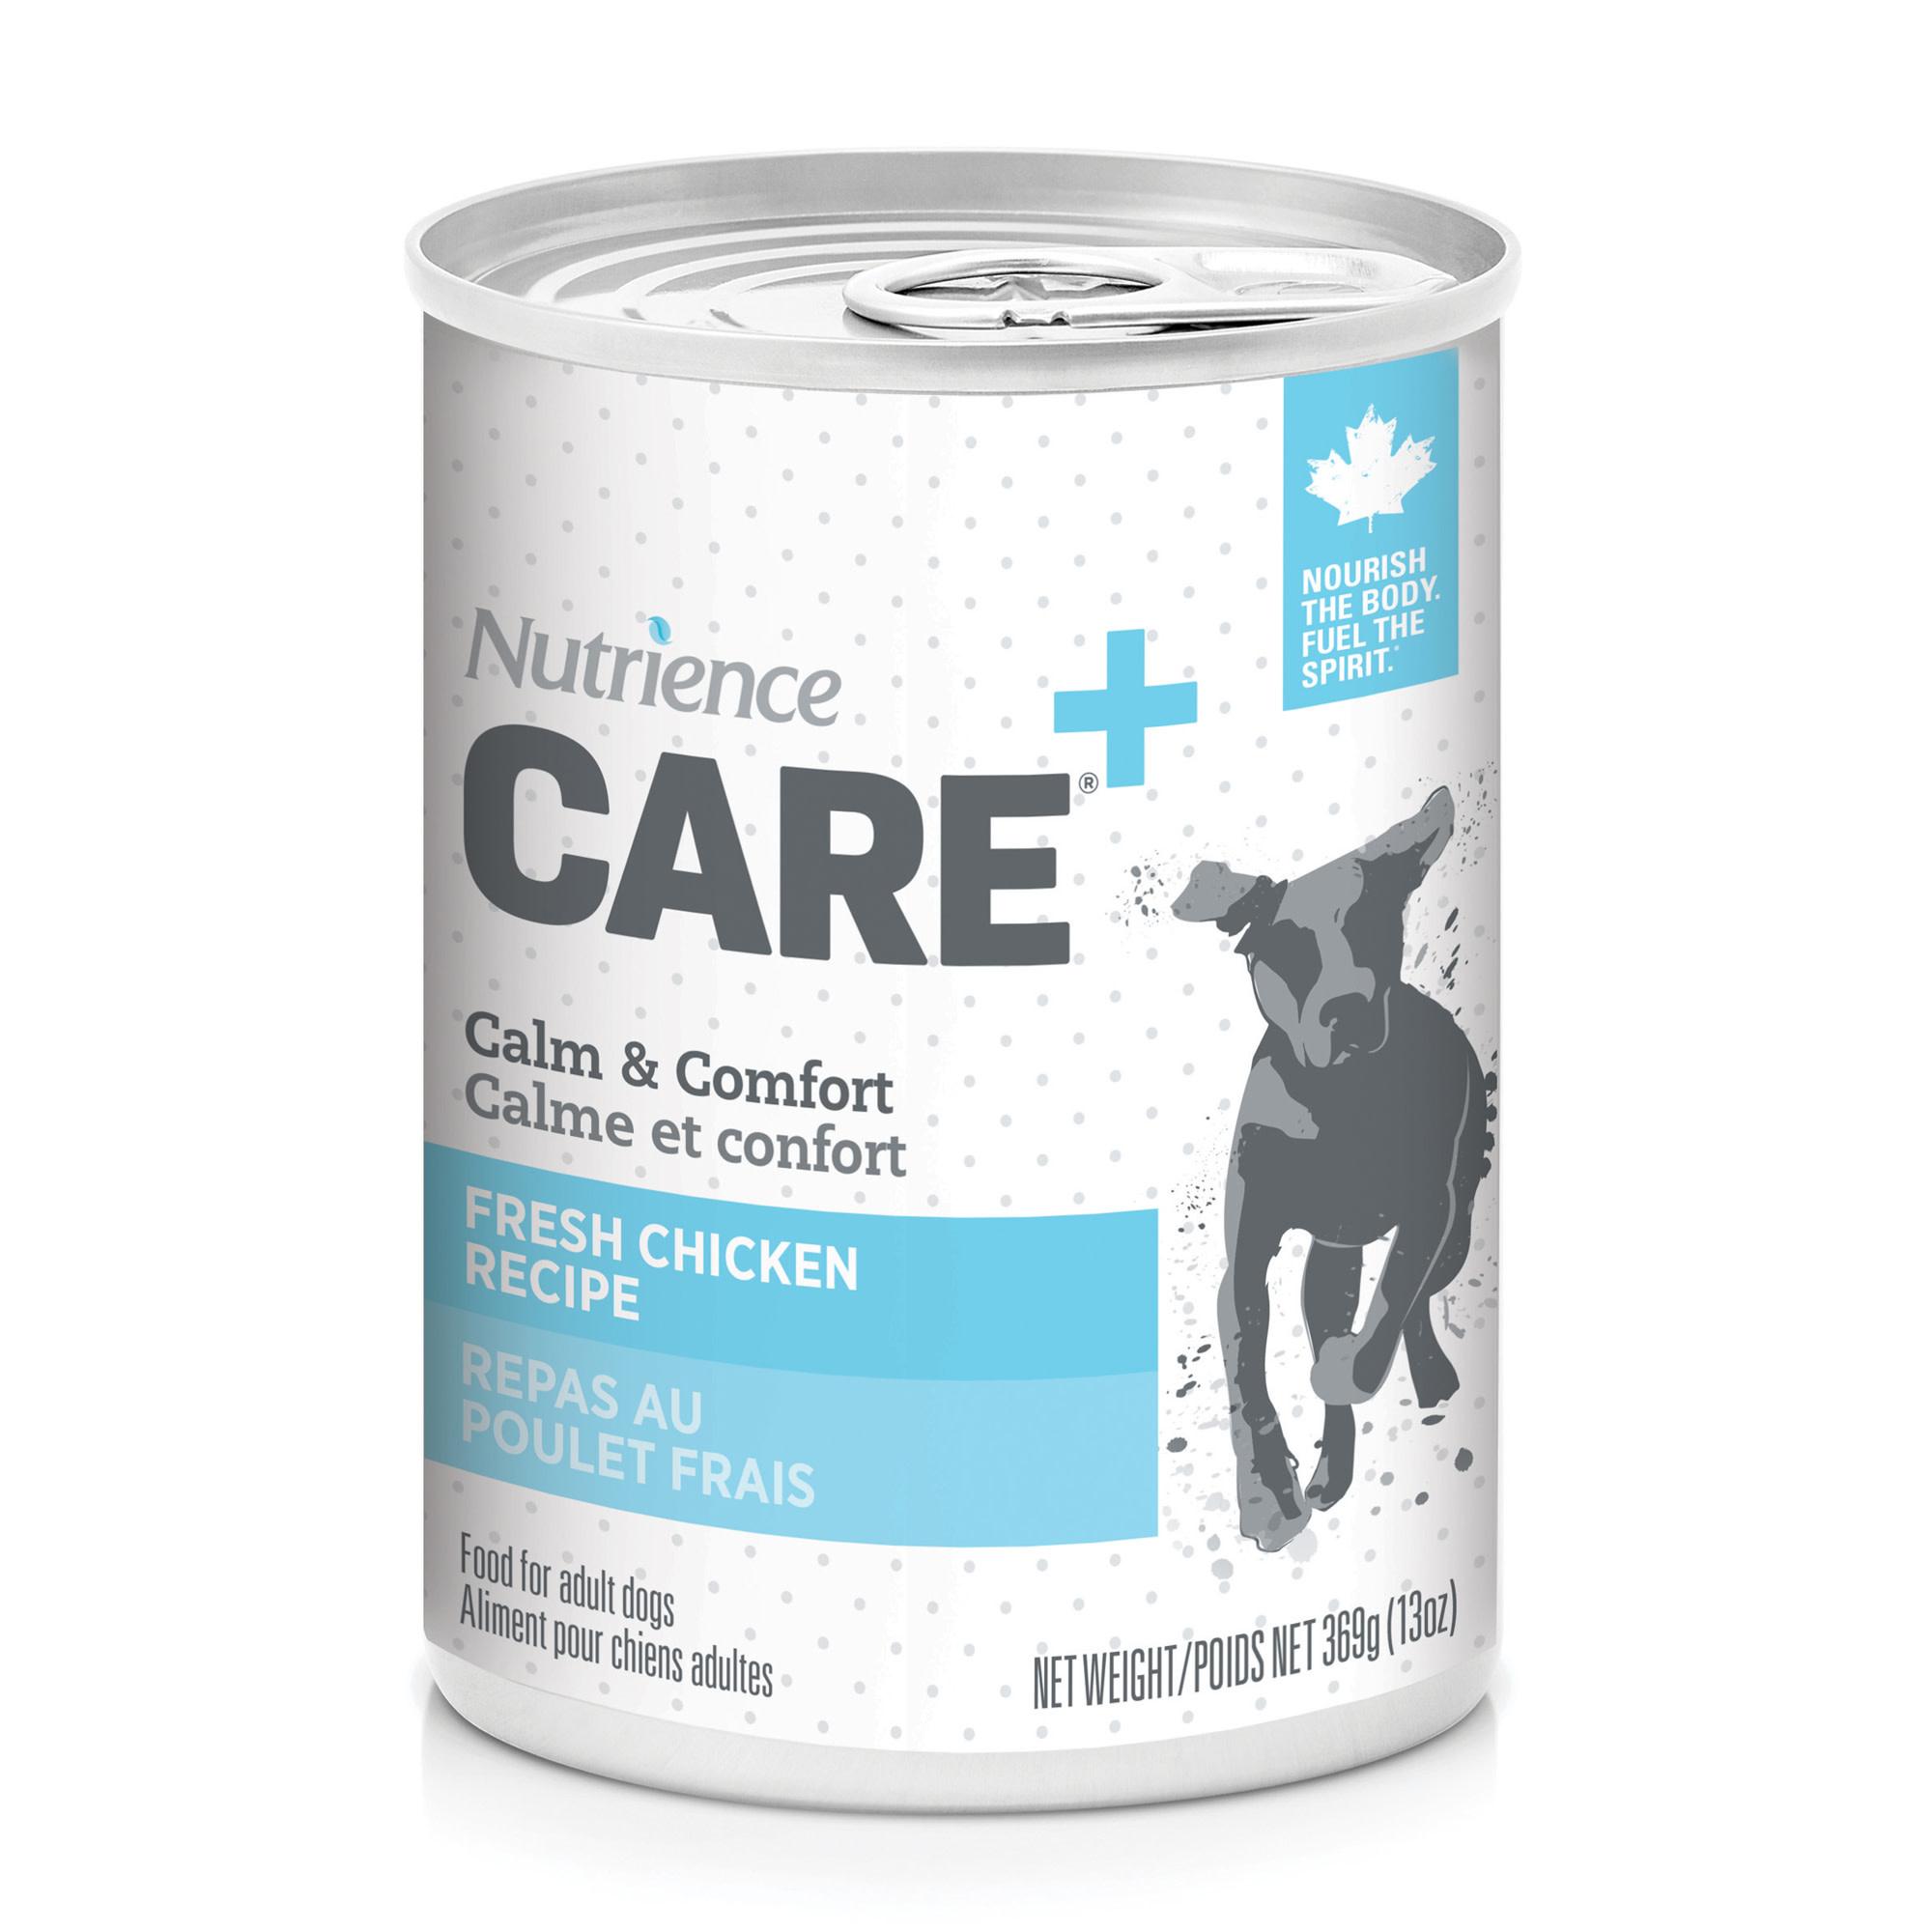 Care Dog Calm & Comfort - Chicken - 369g-1